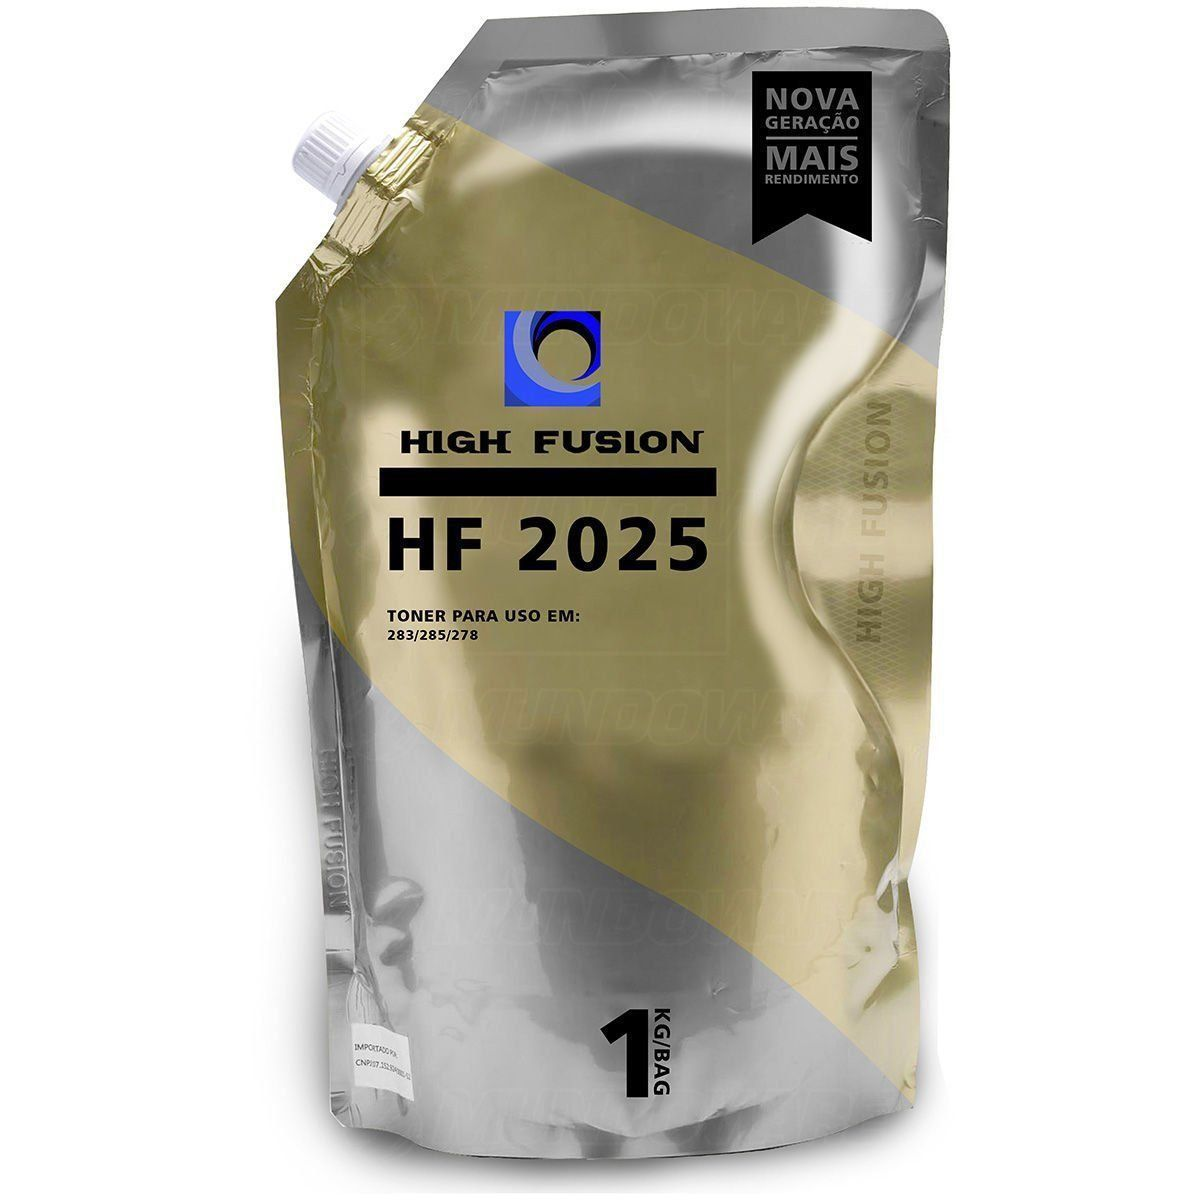 PO HP 278/285/283 HF2025 1KG - HIGH FUSION